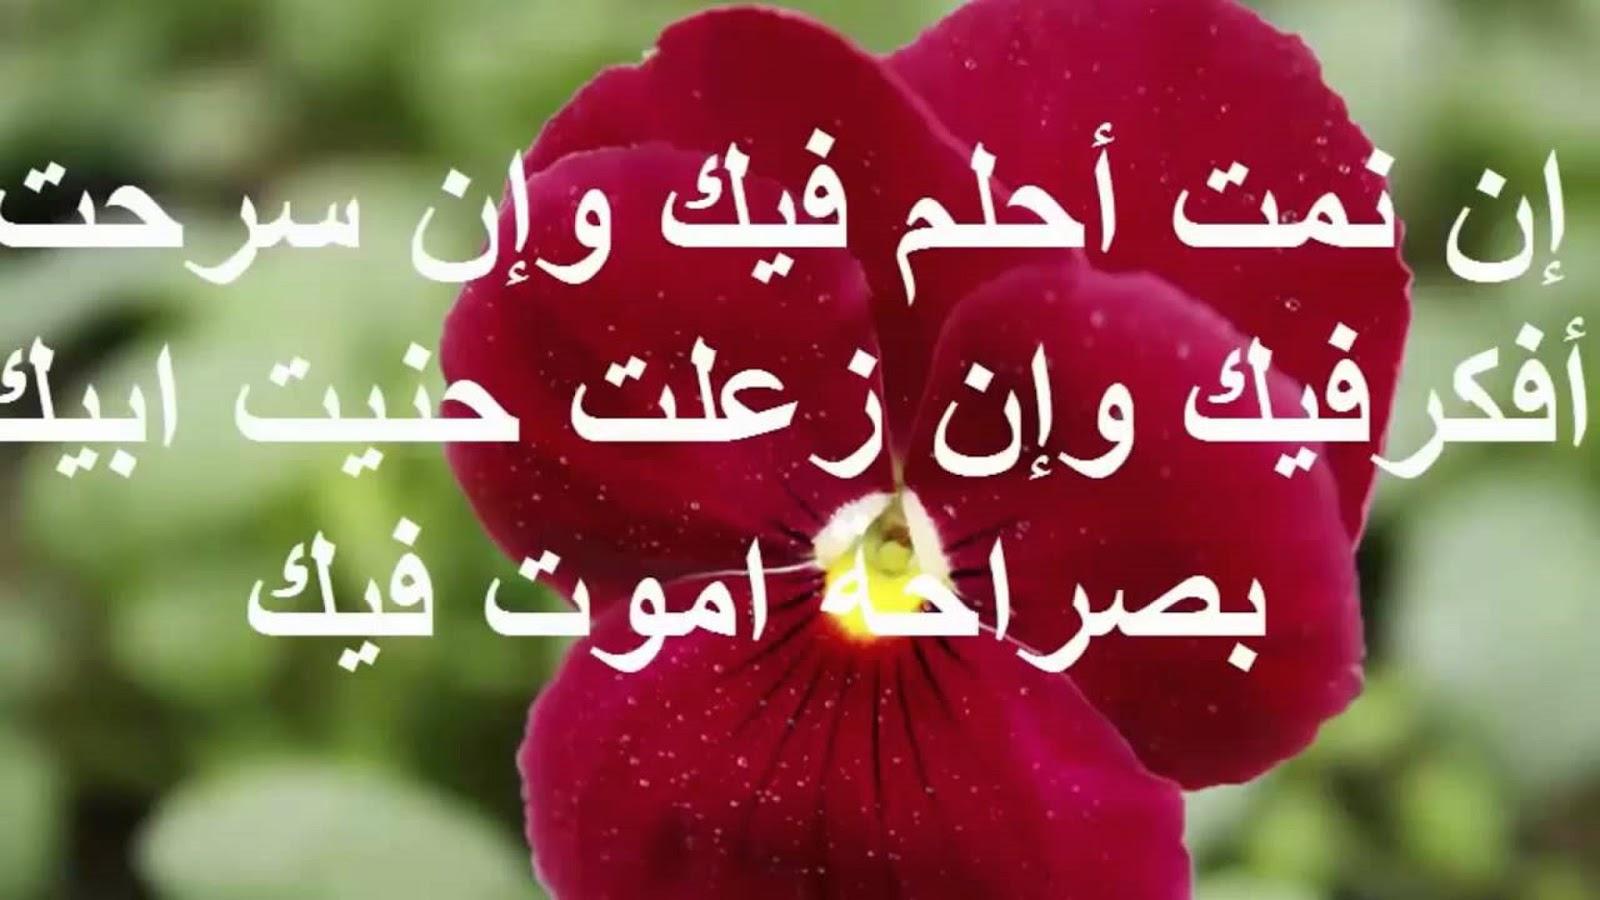 بالصور رسائل حب وعشق , اجمل رسالة حب وغرام 4890 3